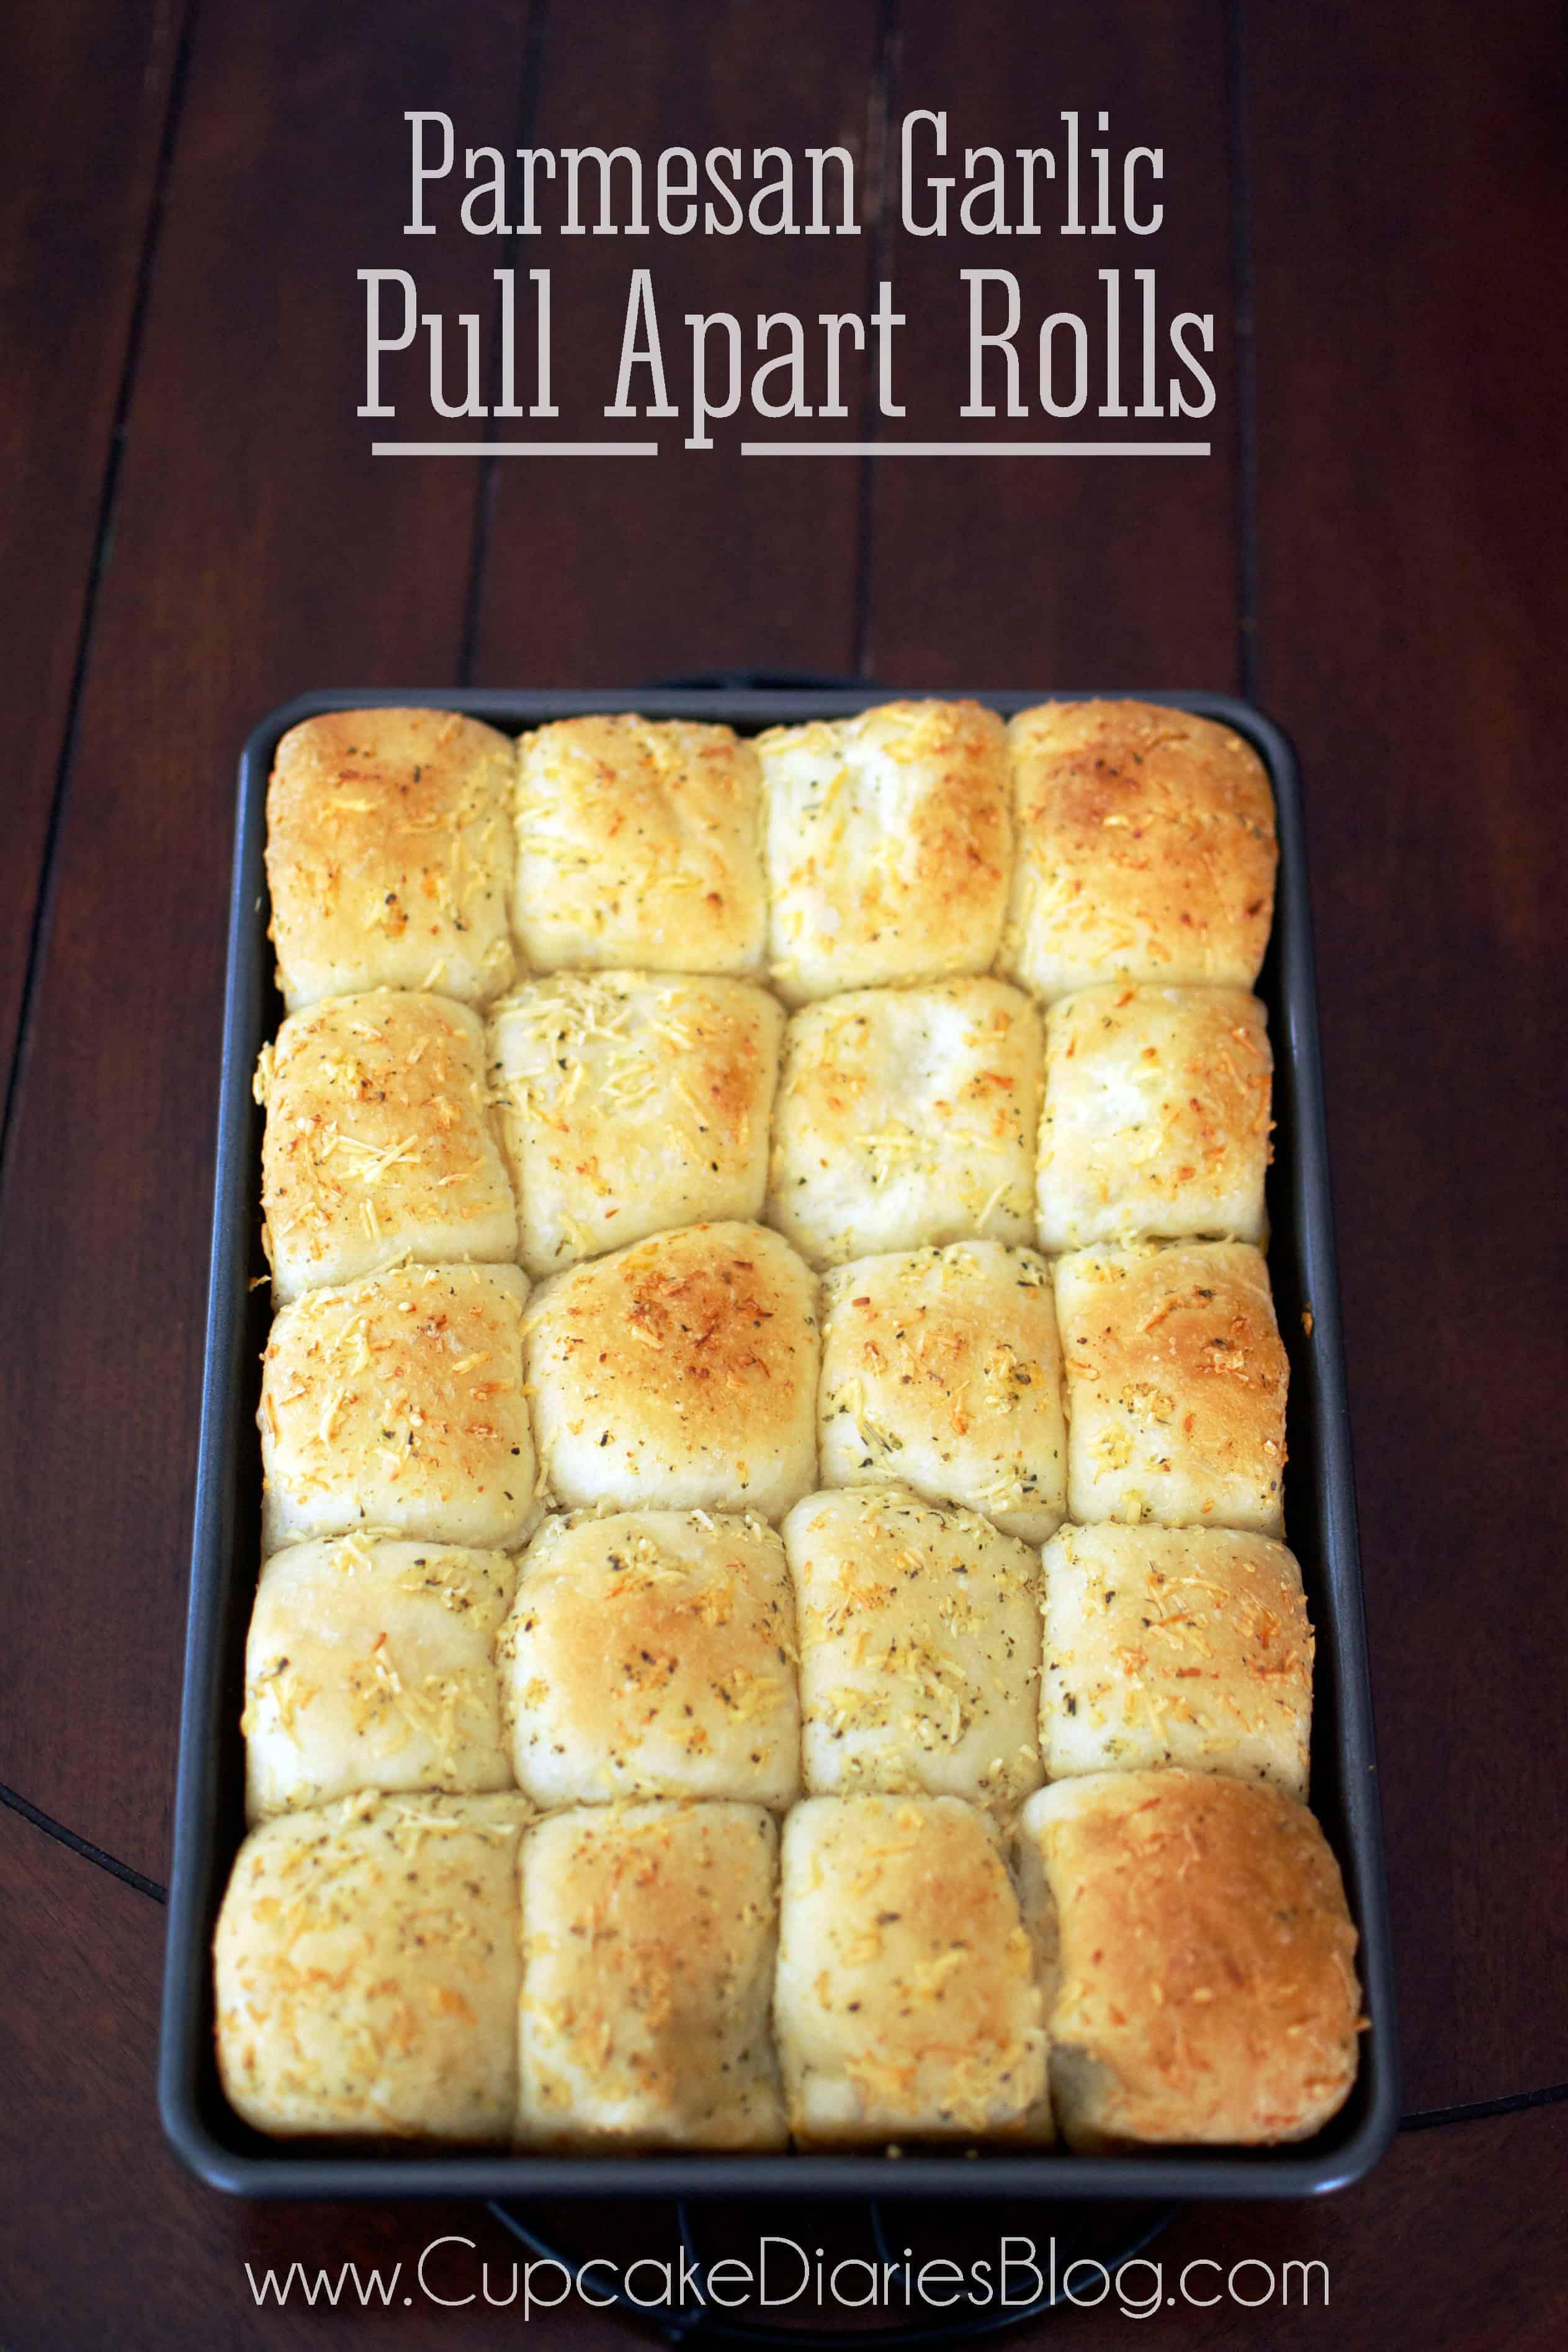 Parmesan Garlic Pull Apart Rolls Cupcake Diaries